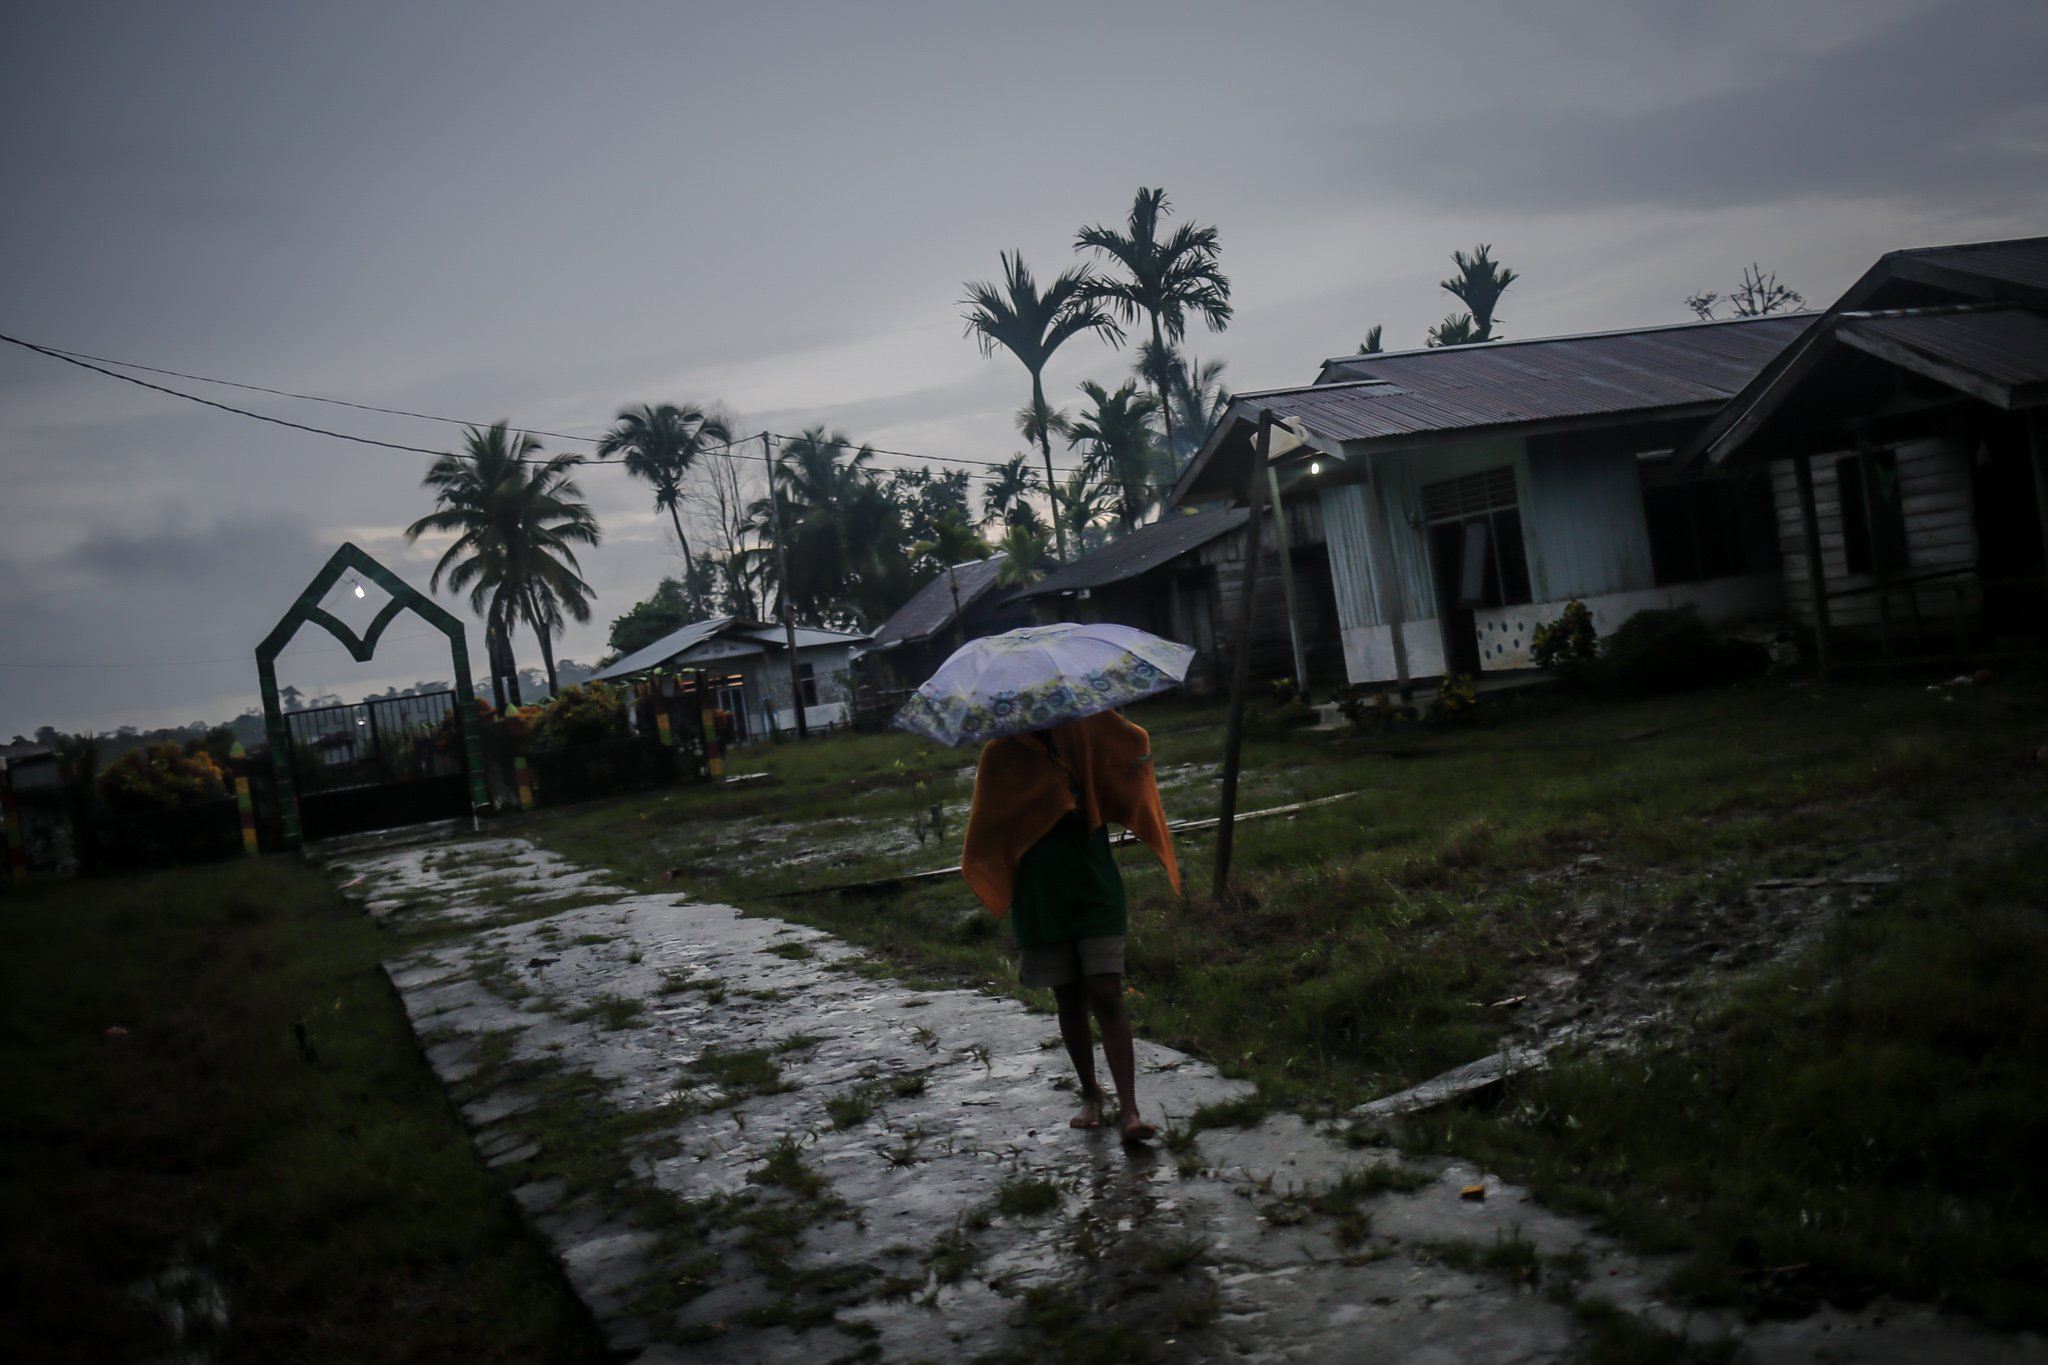 Sejumlah warga mennggunakan handuk dan payung berjalan di Distrik Segun, Kabupaten Sorong, Papua Barat, Minggu, (19/9/2021).